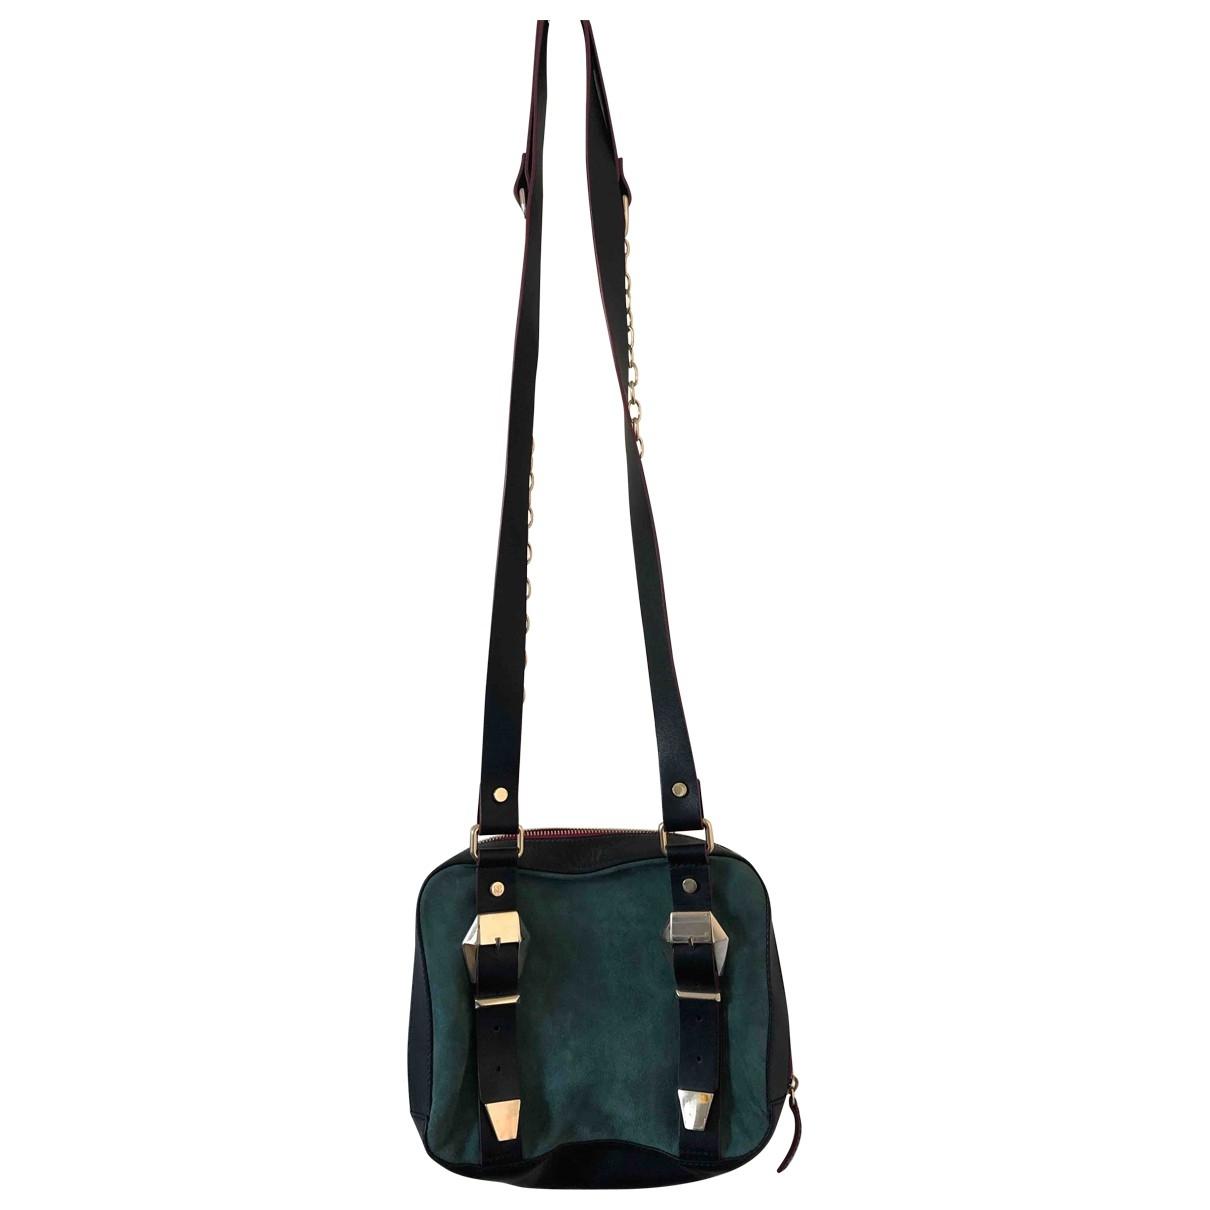 M Missoni \N Multicolour Leather handbag for Women \N